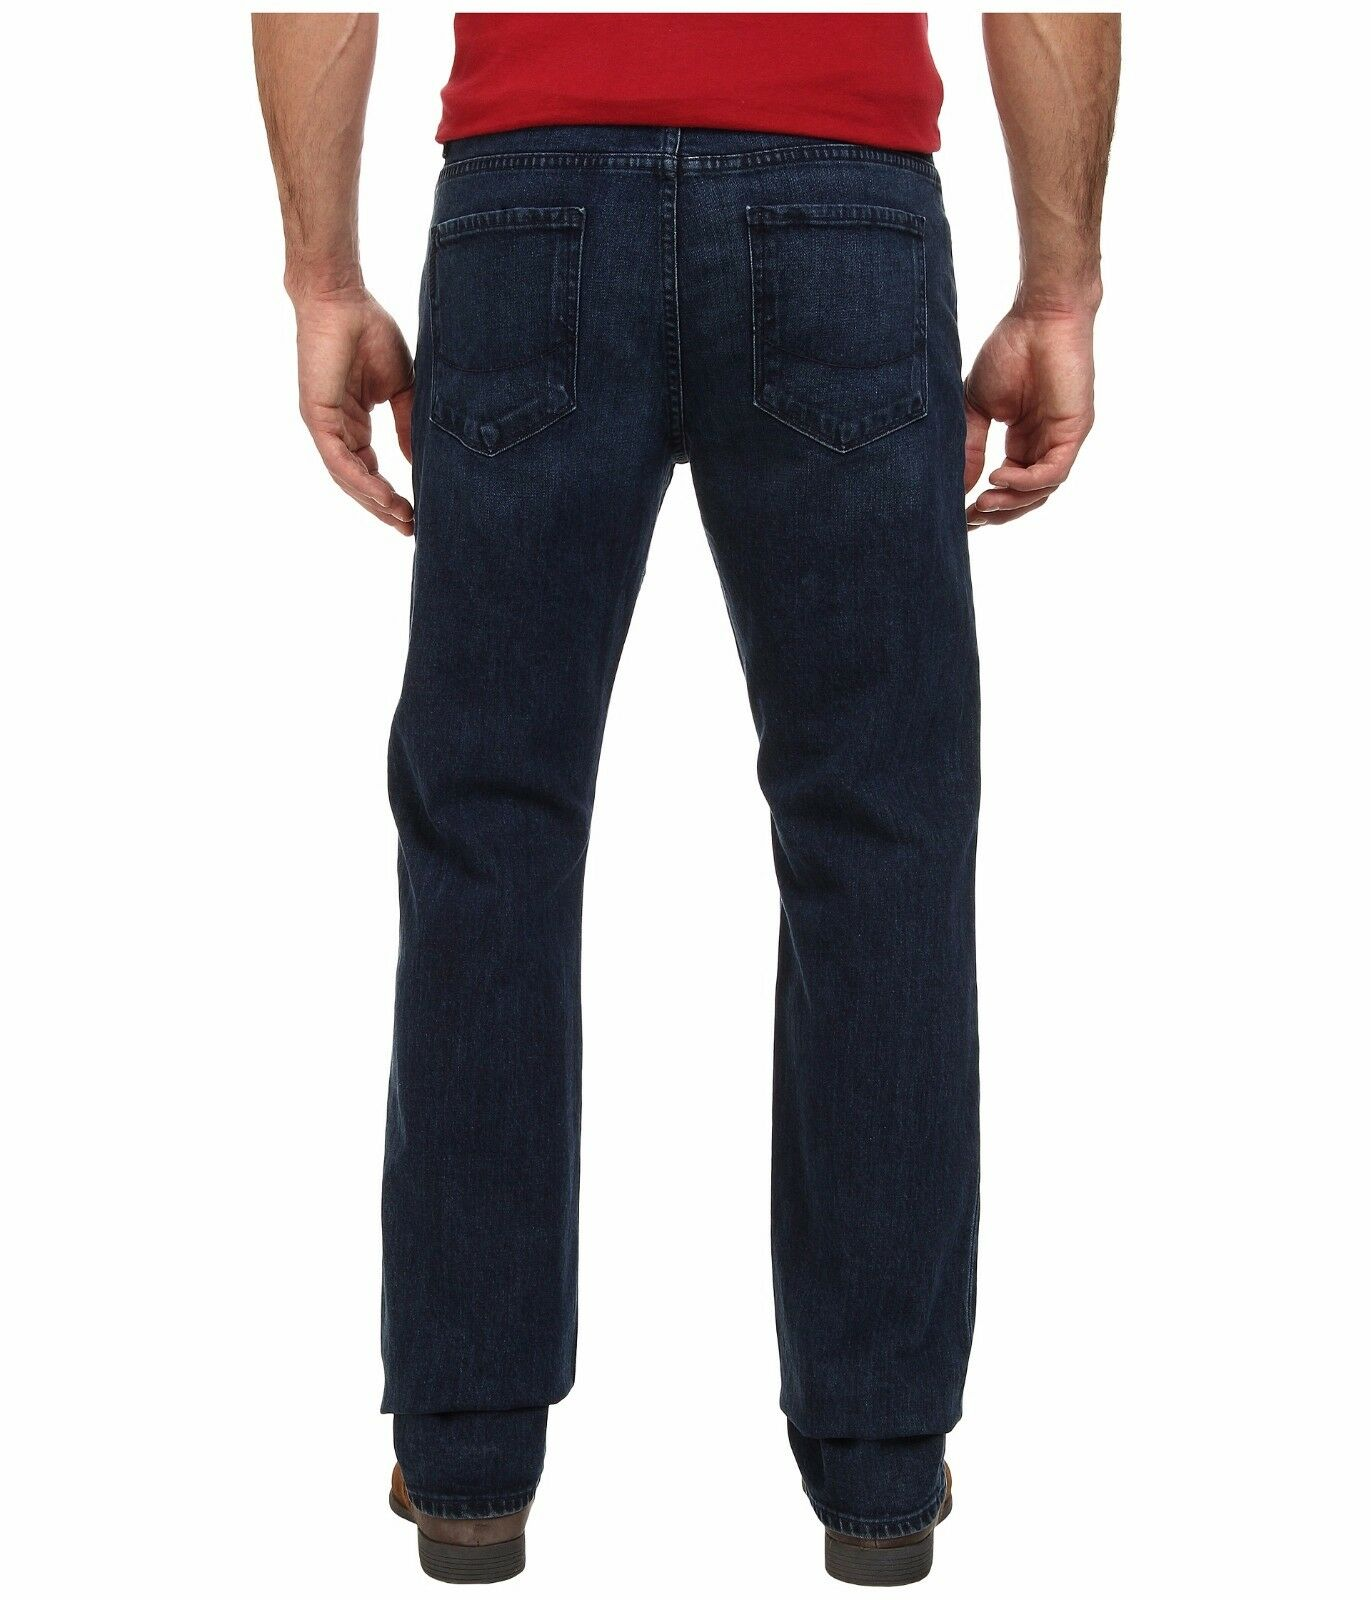 Nwt Paige Jeans Herren Sz29 Doheny Straight-Stretch Jeans Spencer